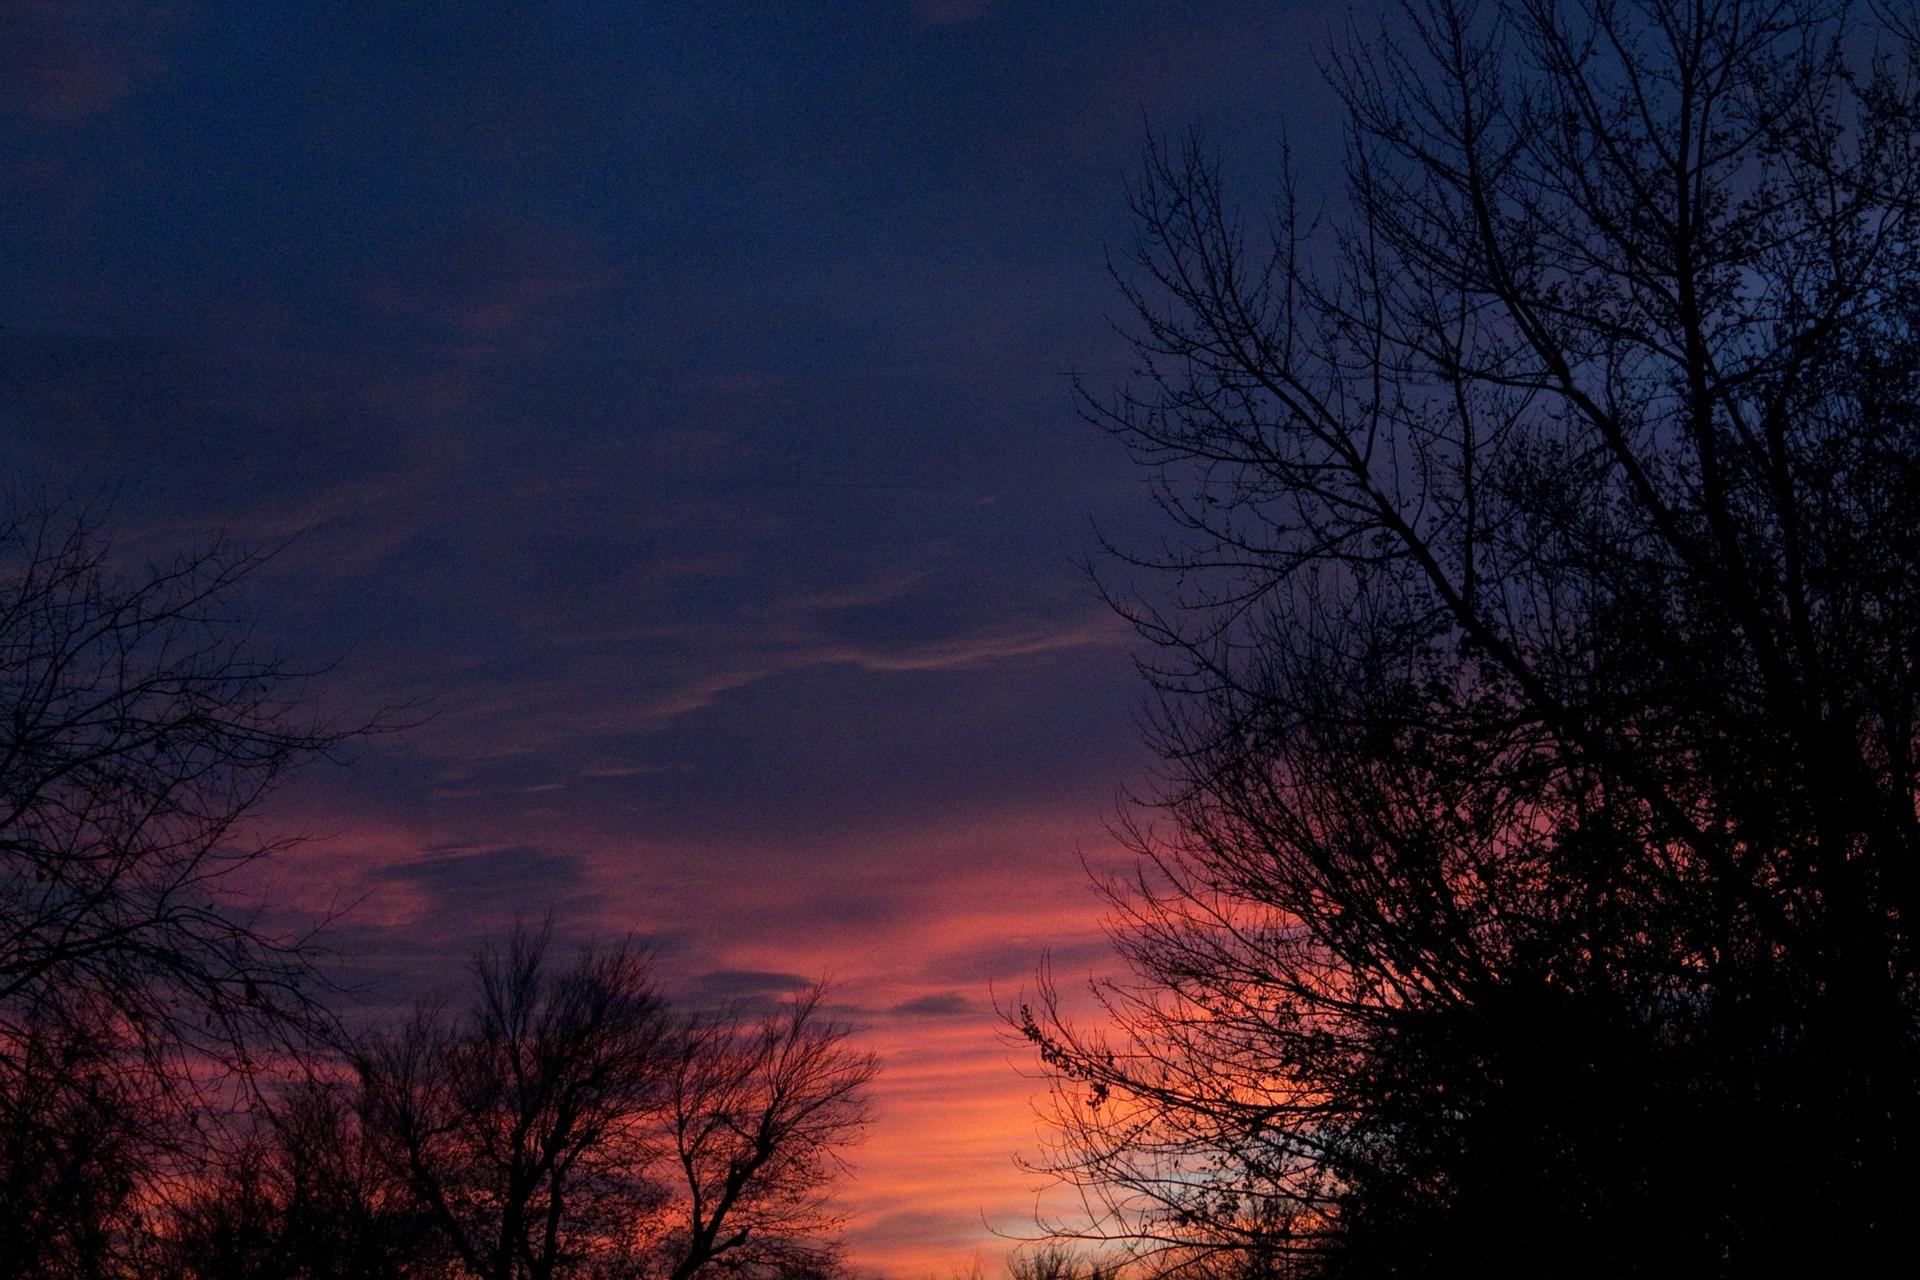 sunset-68777_1920